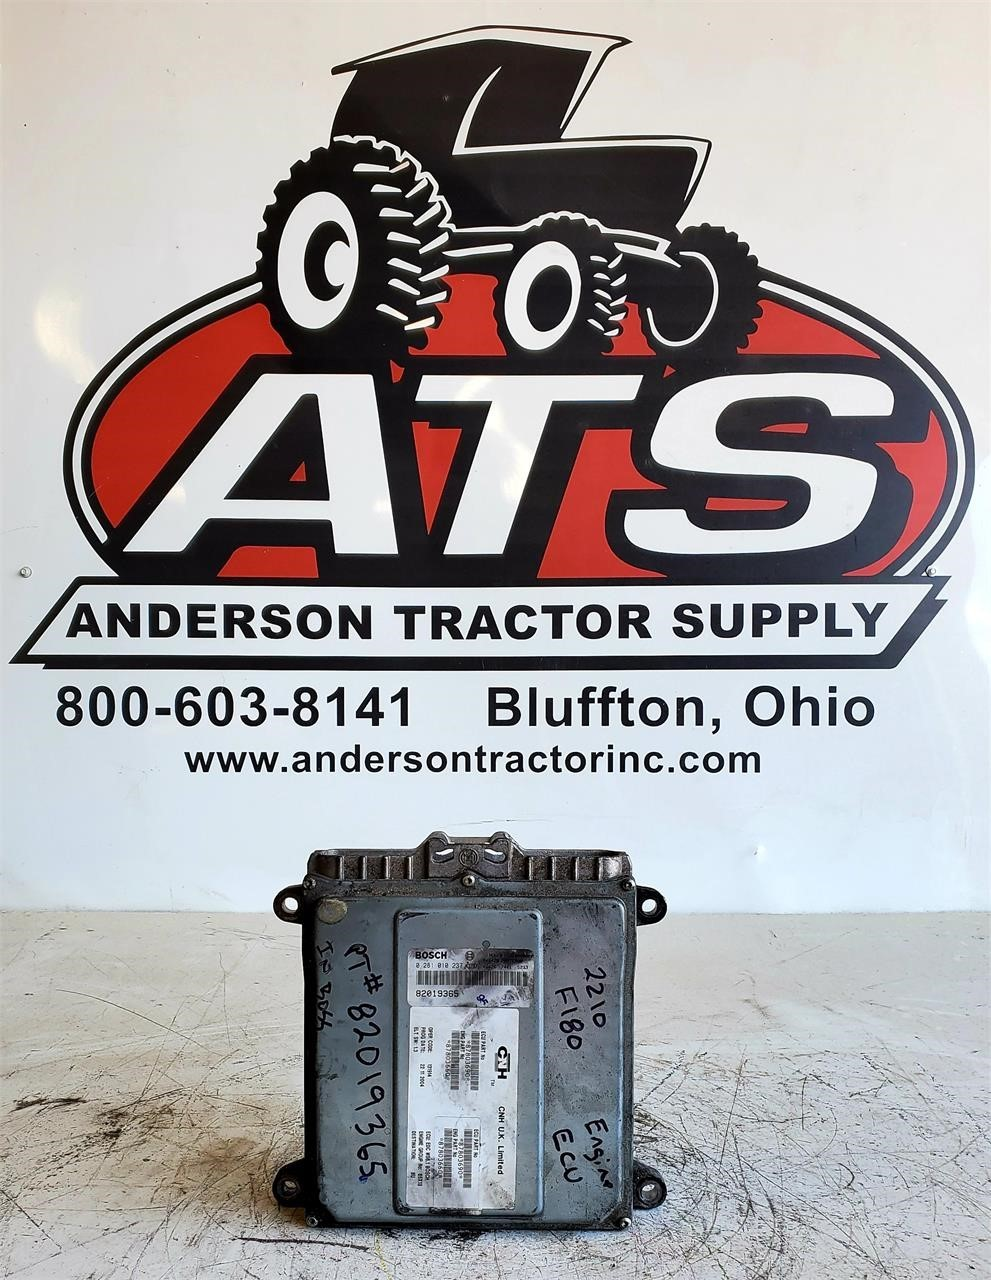 Buhler Versatile 2210 Tractor